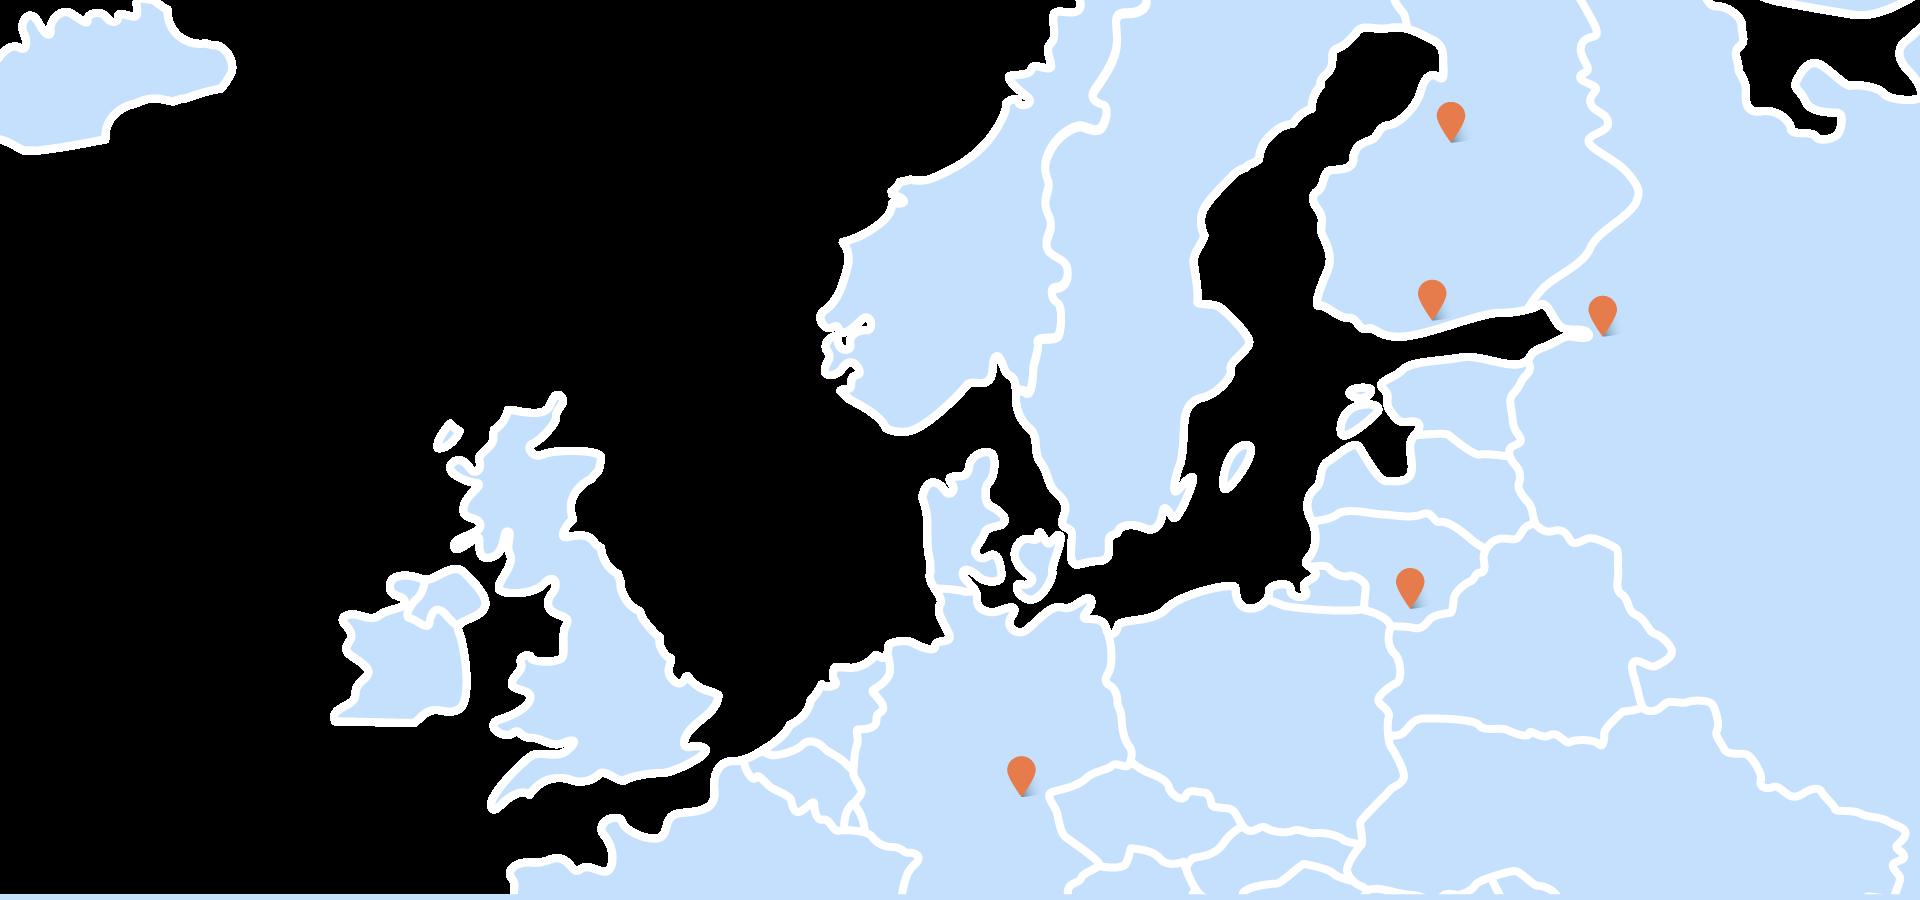 m-filter-map_RU_v1